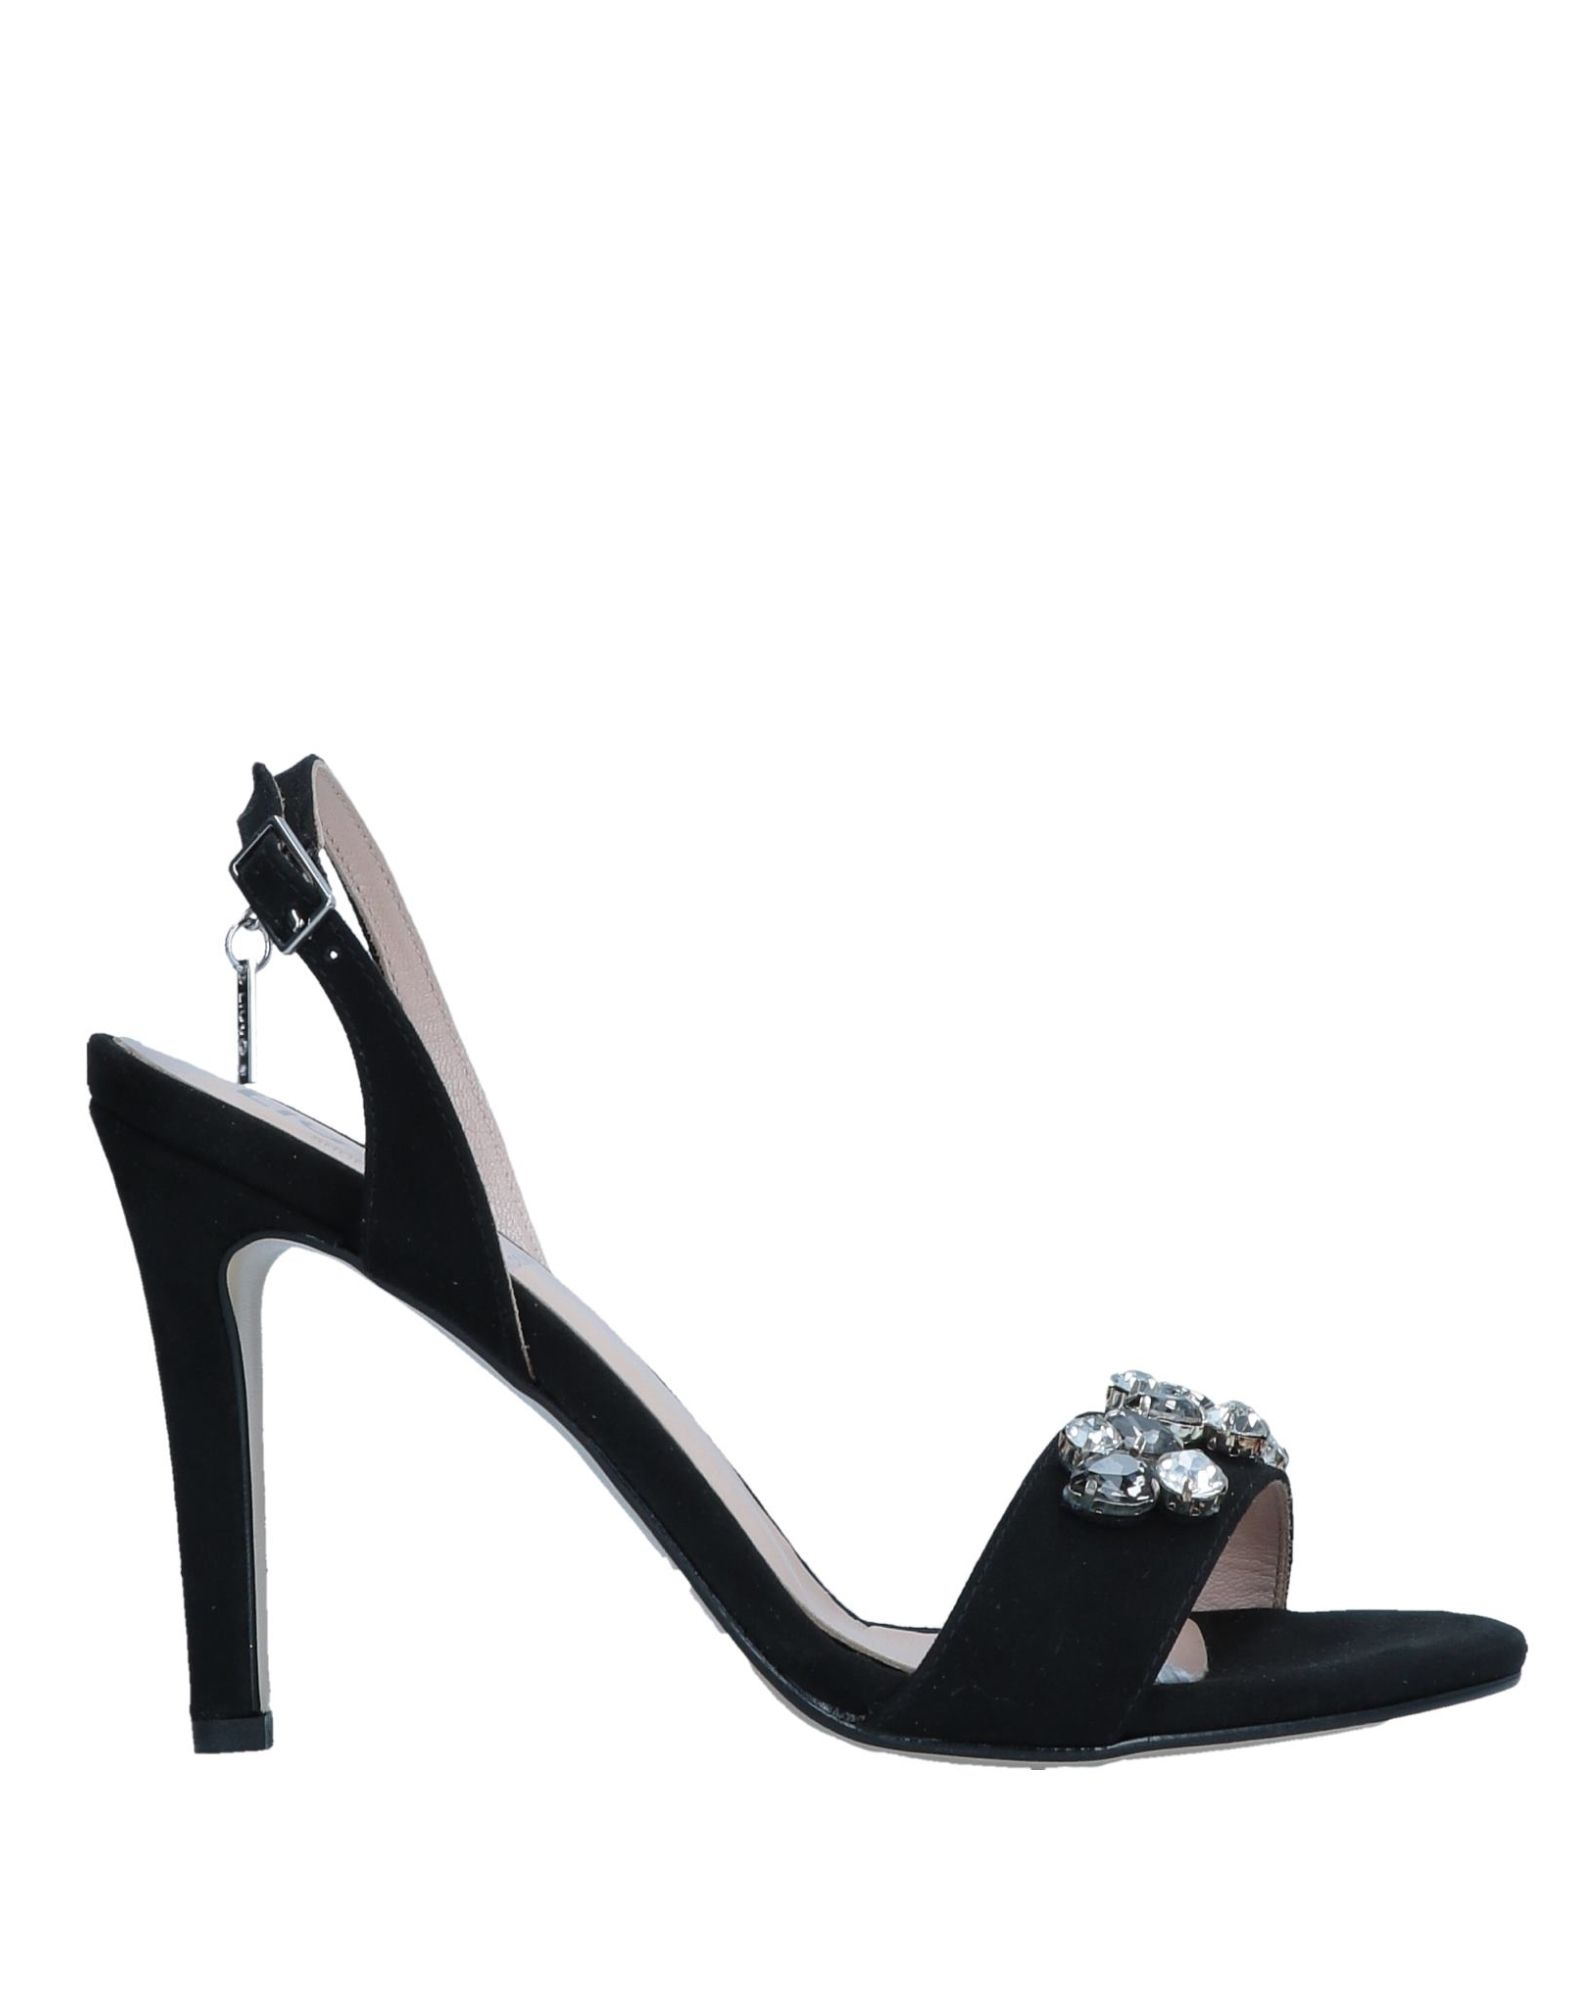 Liu •Jo Shoes Sandals Sandals Sandals - Women Liu •Jo Shoes Sandals online on  United Kingdom - 11546781VK 41ae84